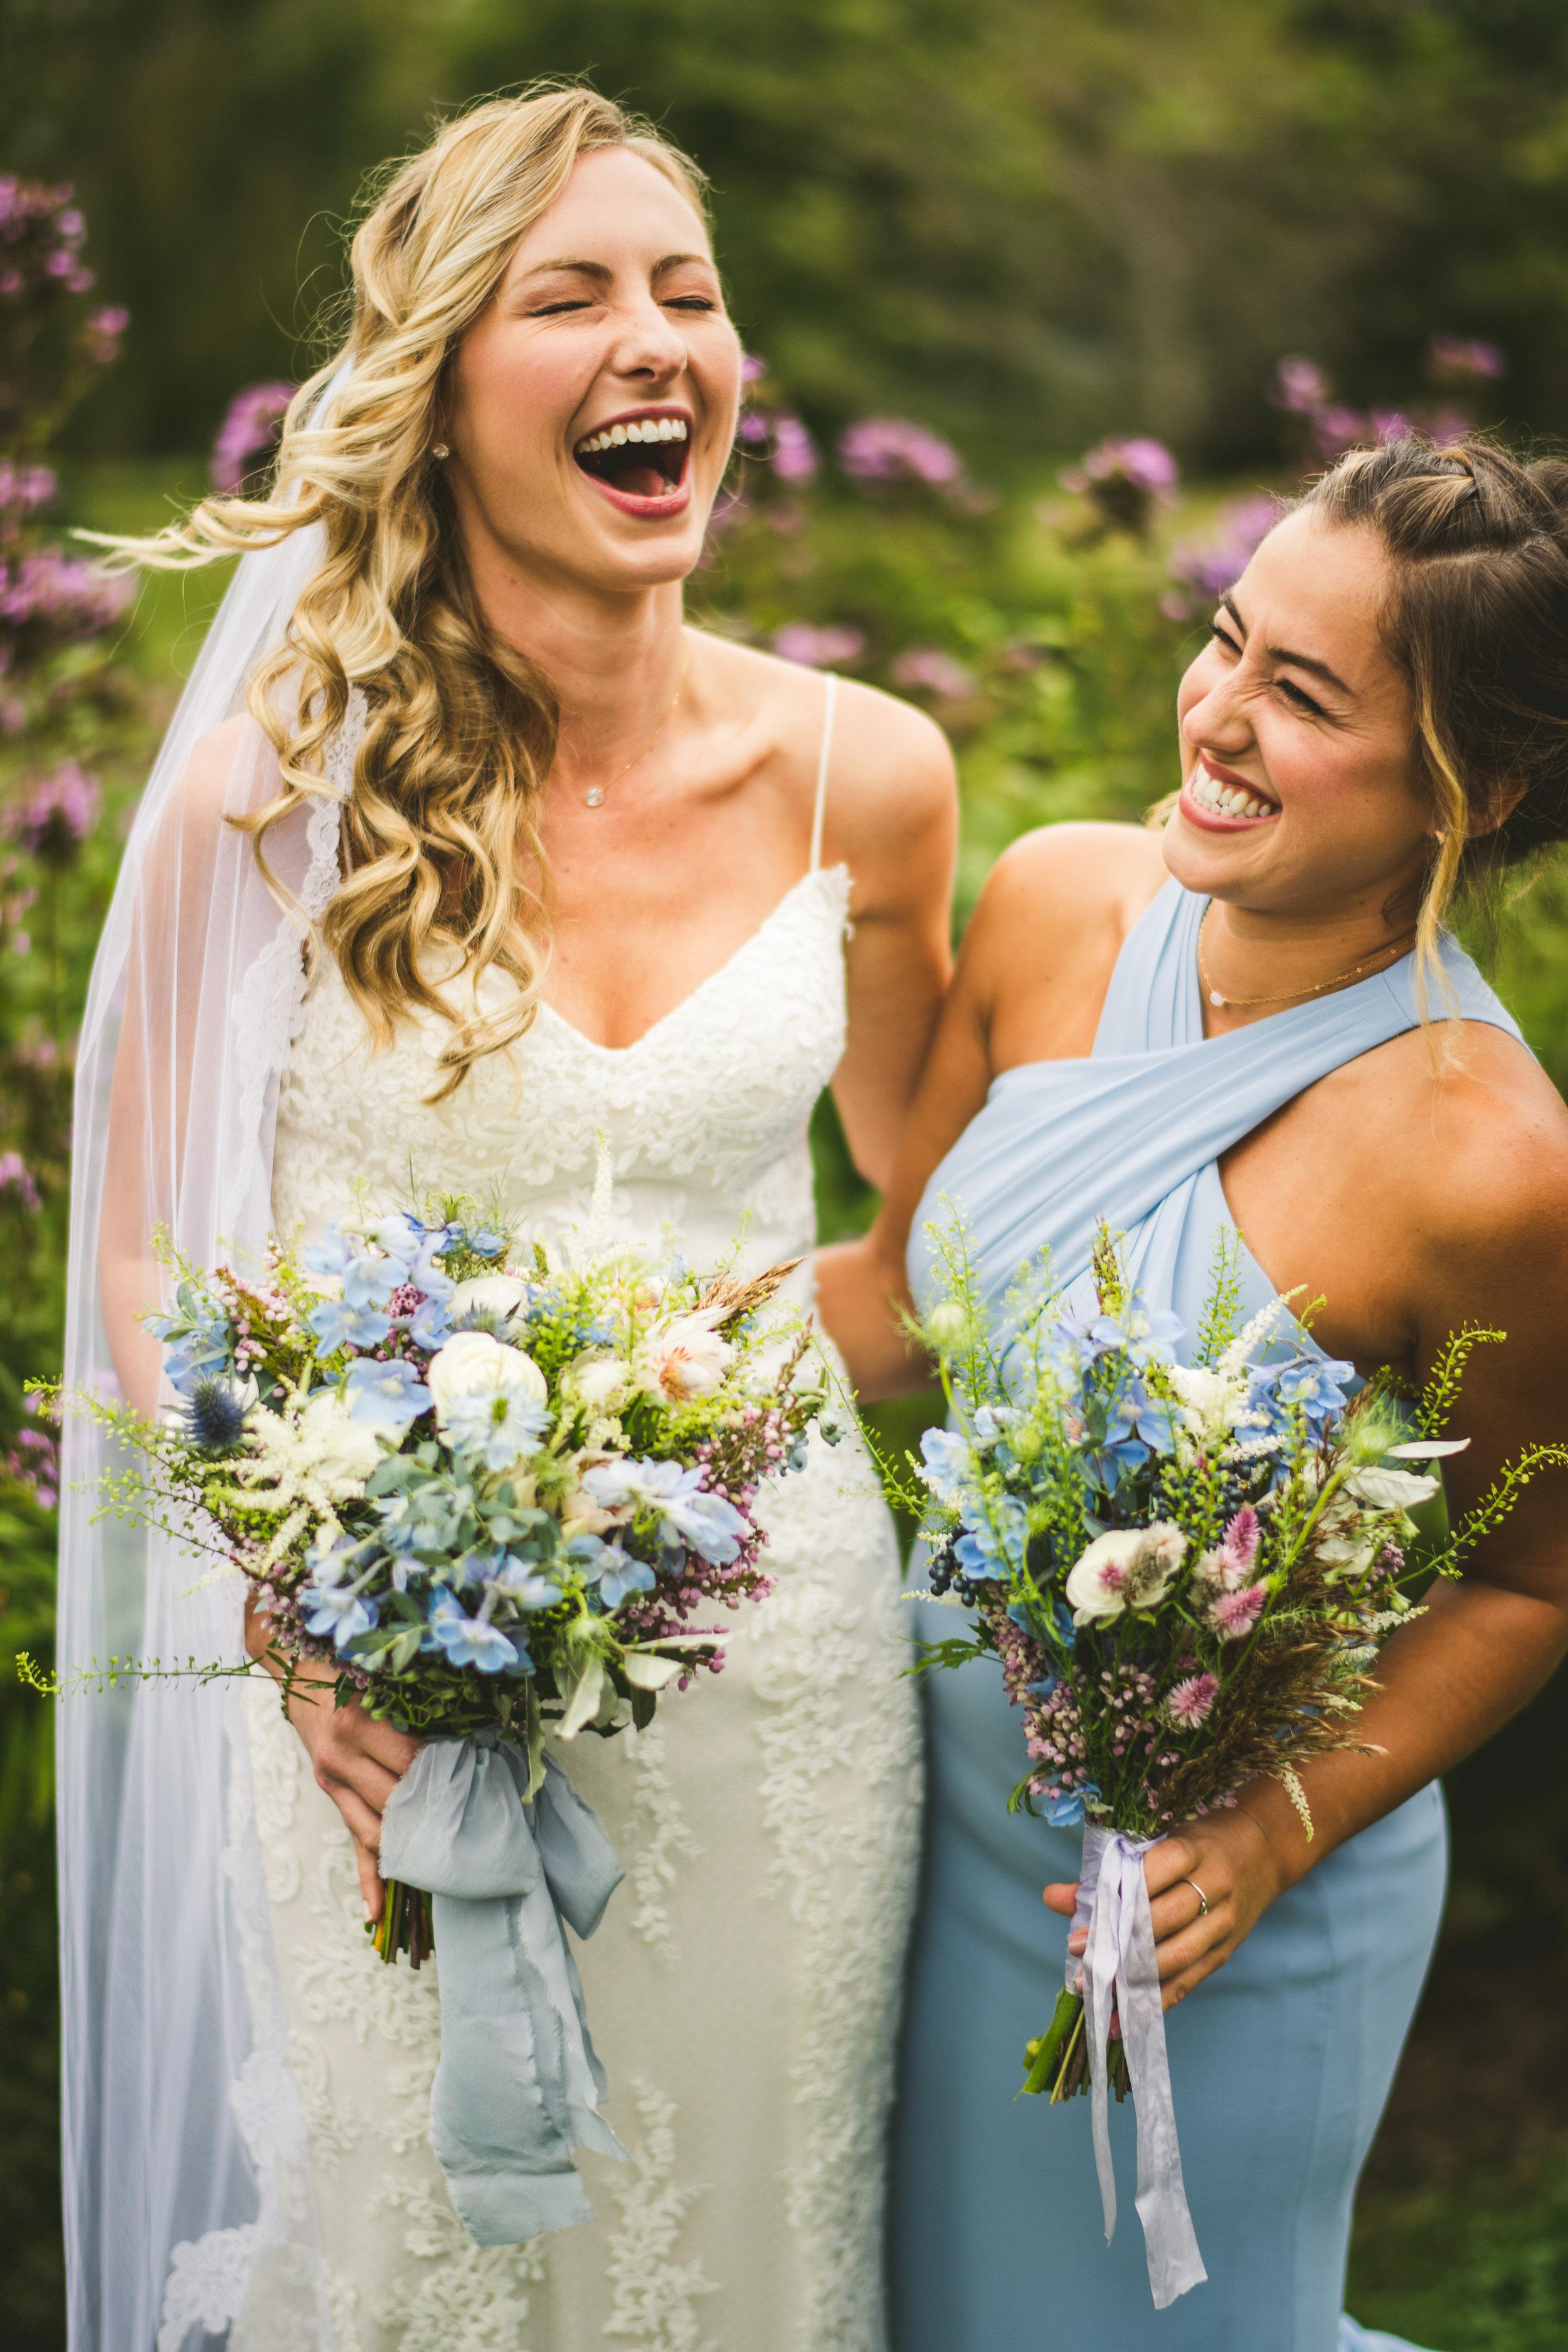 Inn at Fernbrook Wedding, Bouquet, Colorful Bouquet, Sam Hurd Photography